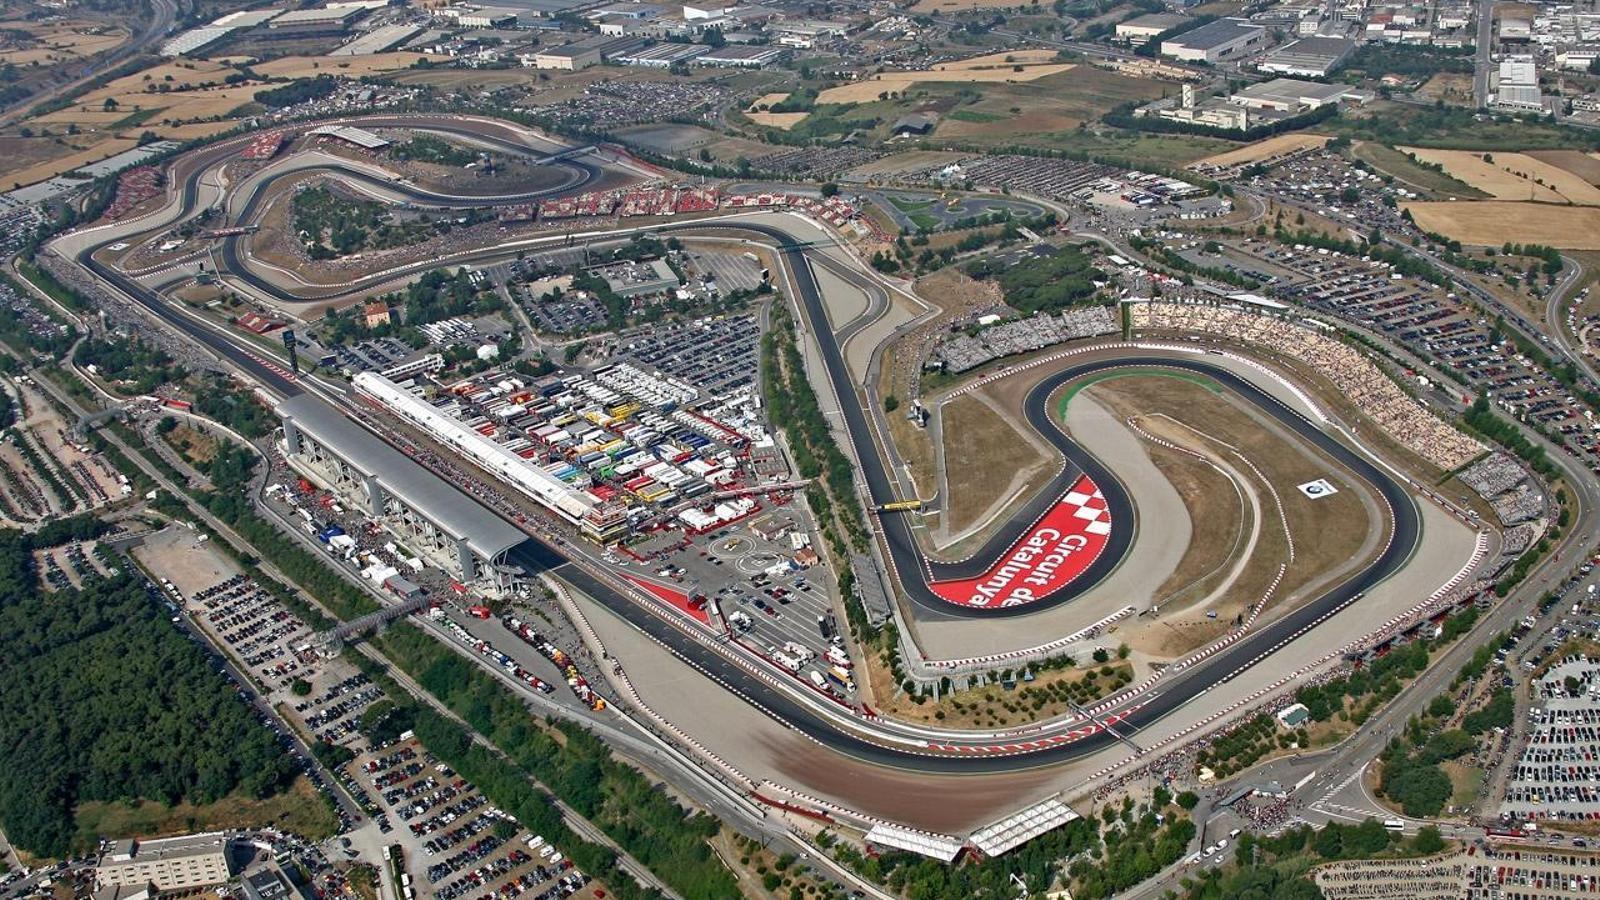 Imatge aèria del circuit de Montmeló